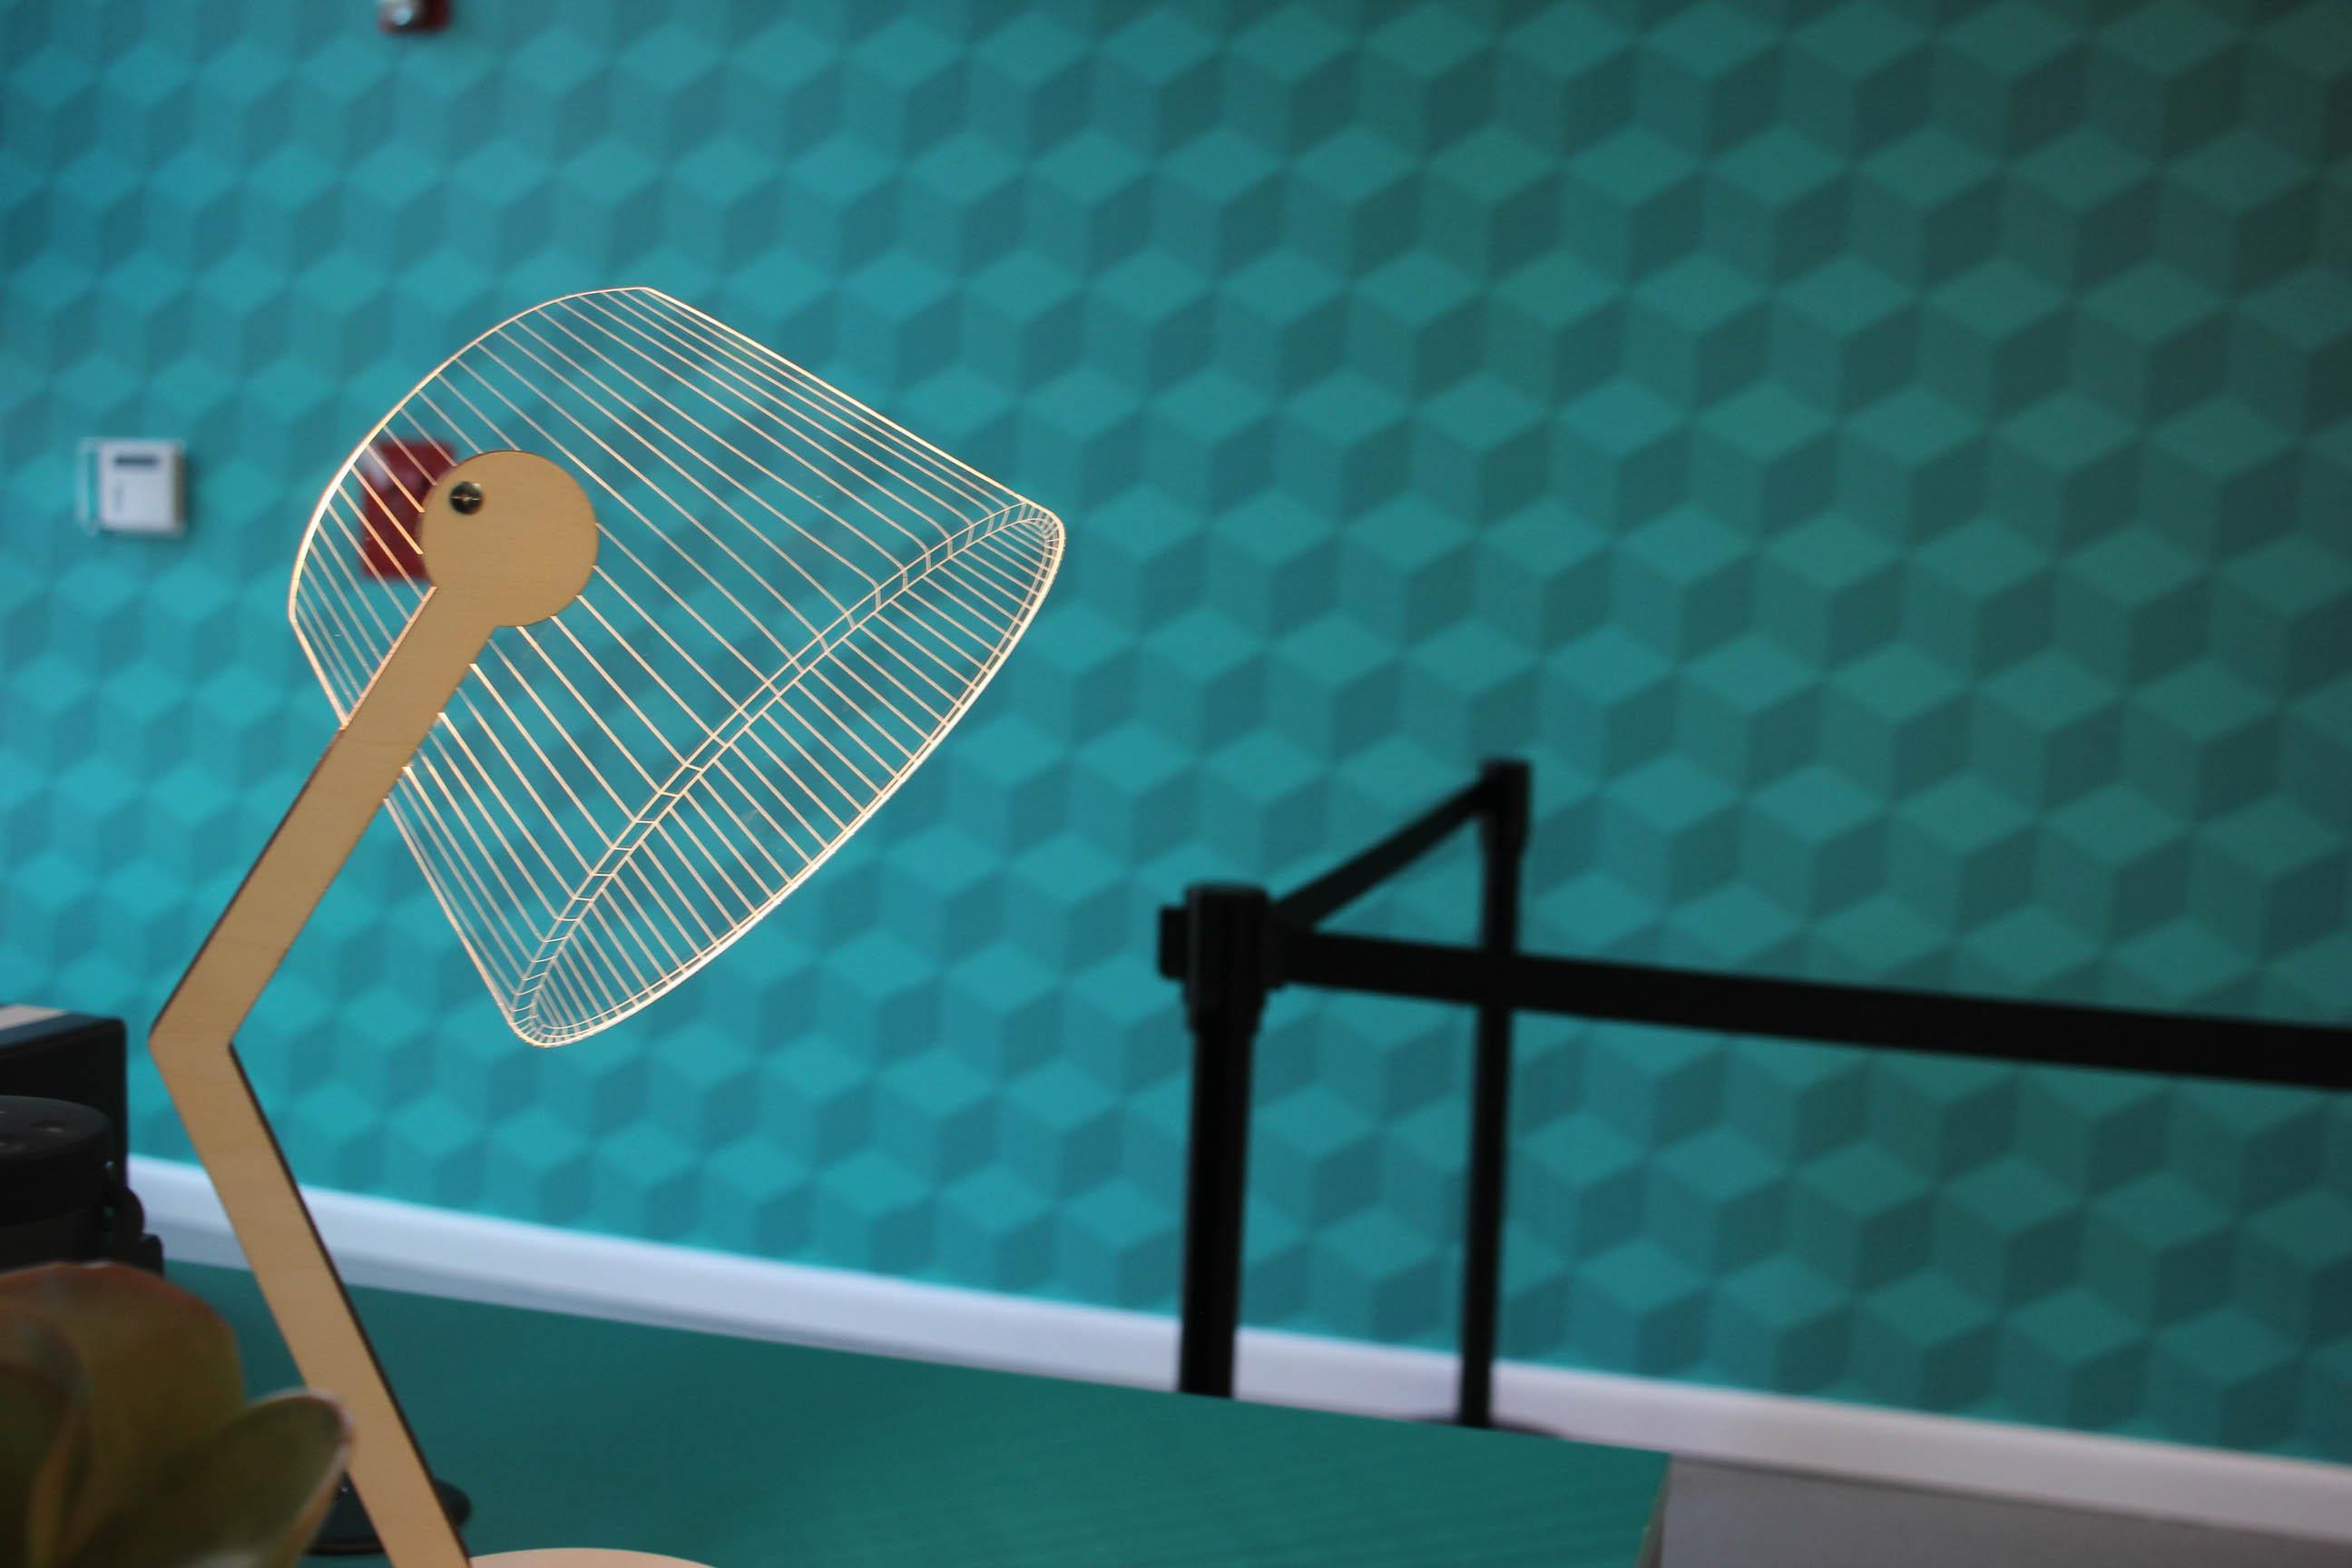 Museum of Illusions photo courtesy of Ruth Ann Vasquez